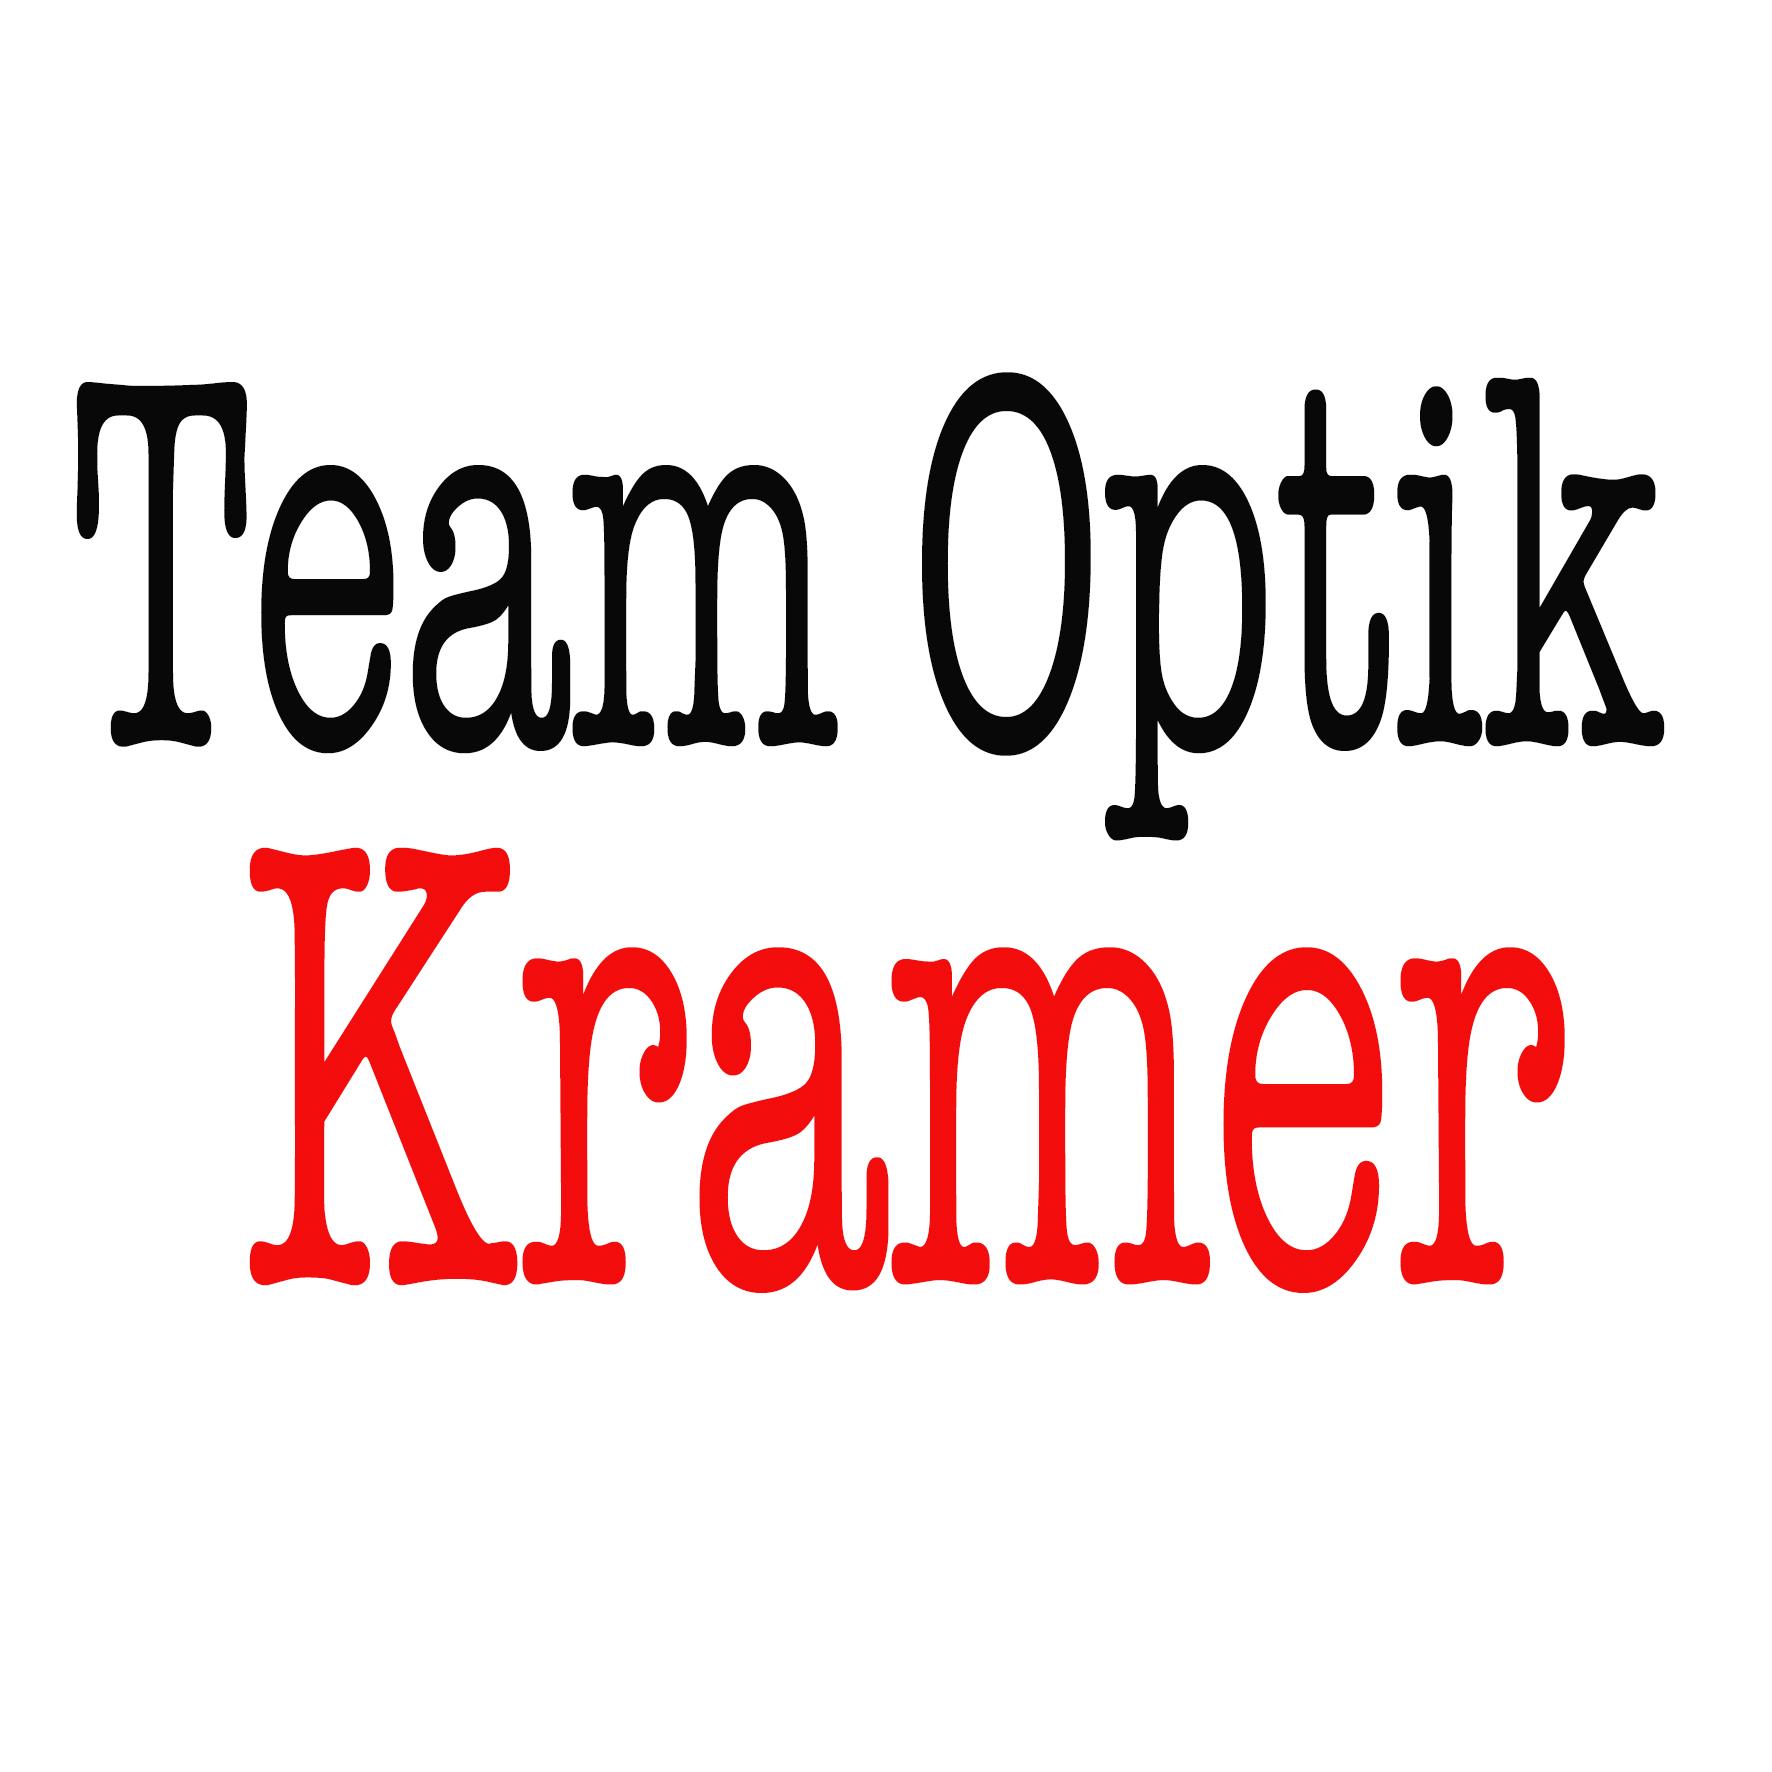 Team Optik Kramer